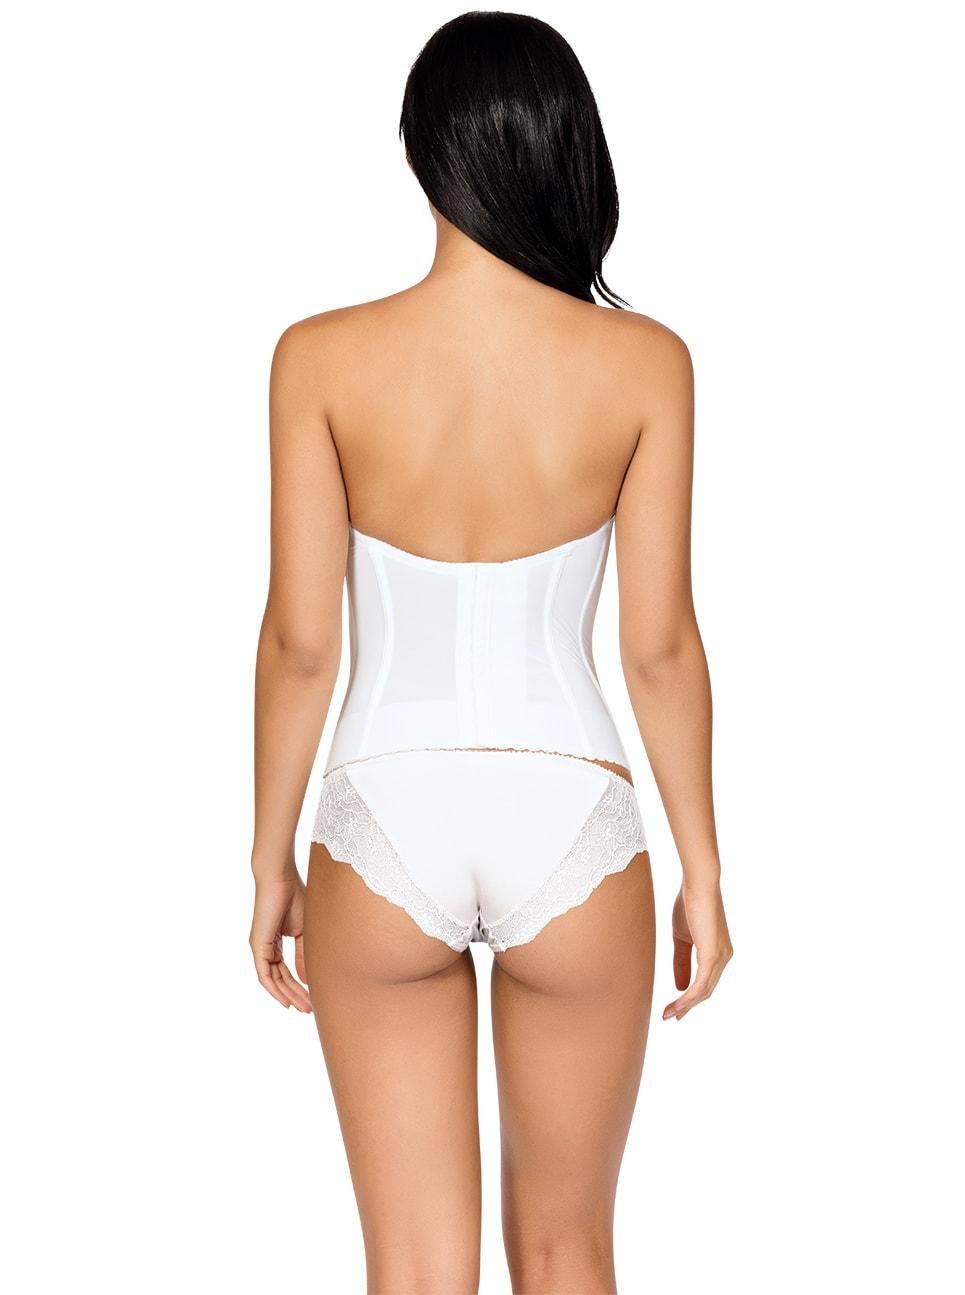 PARFAIT Elissa Low BackBustierP5017 BikiniP5013 PearlWhite Back copy - Elissa Low-Back Bustier - Pearl White - P5017